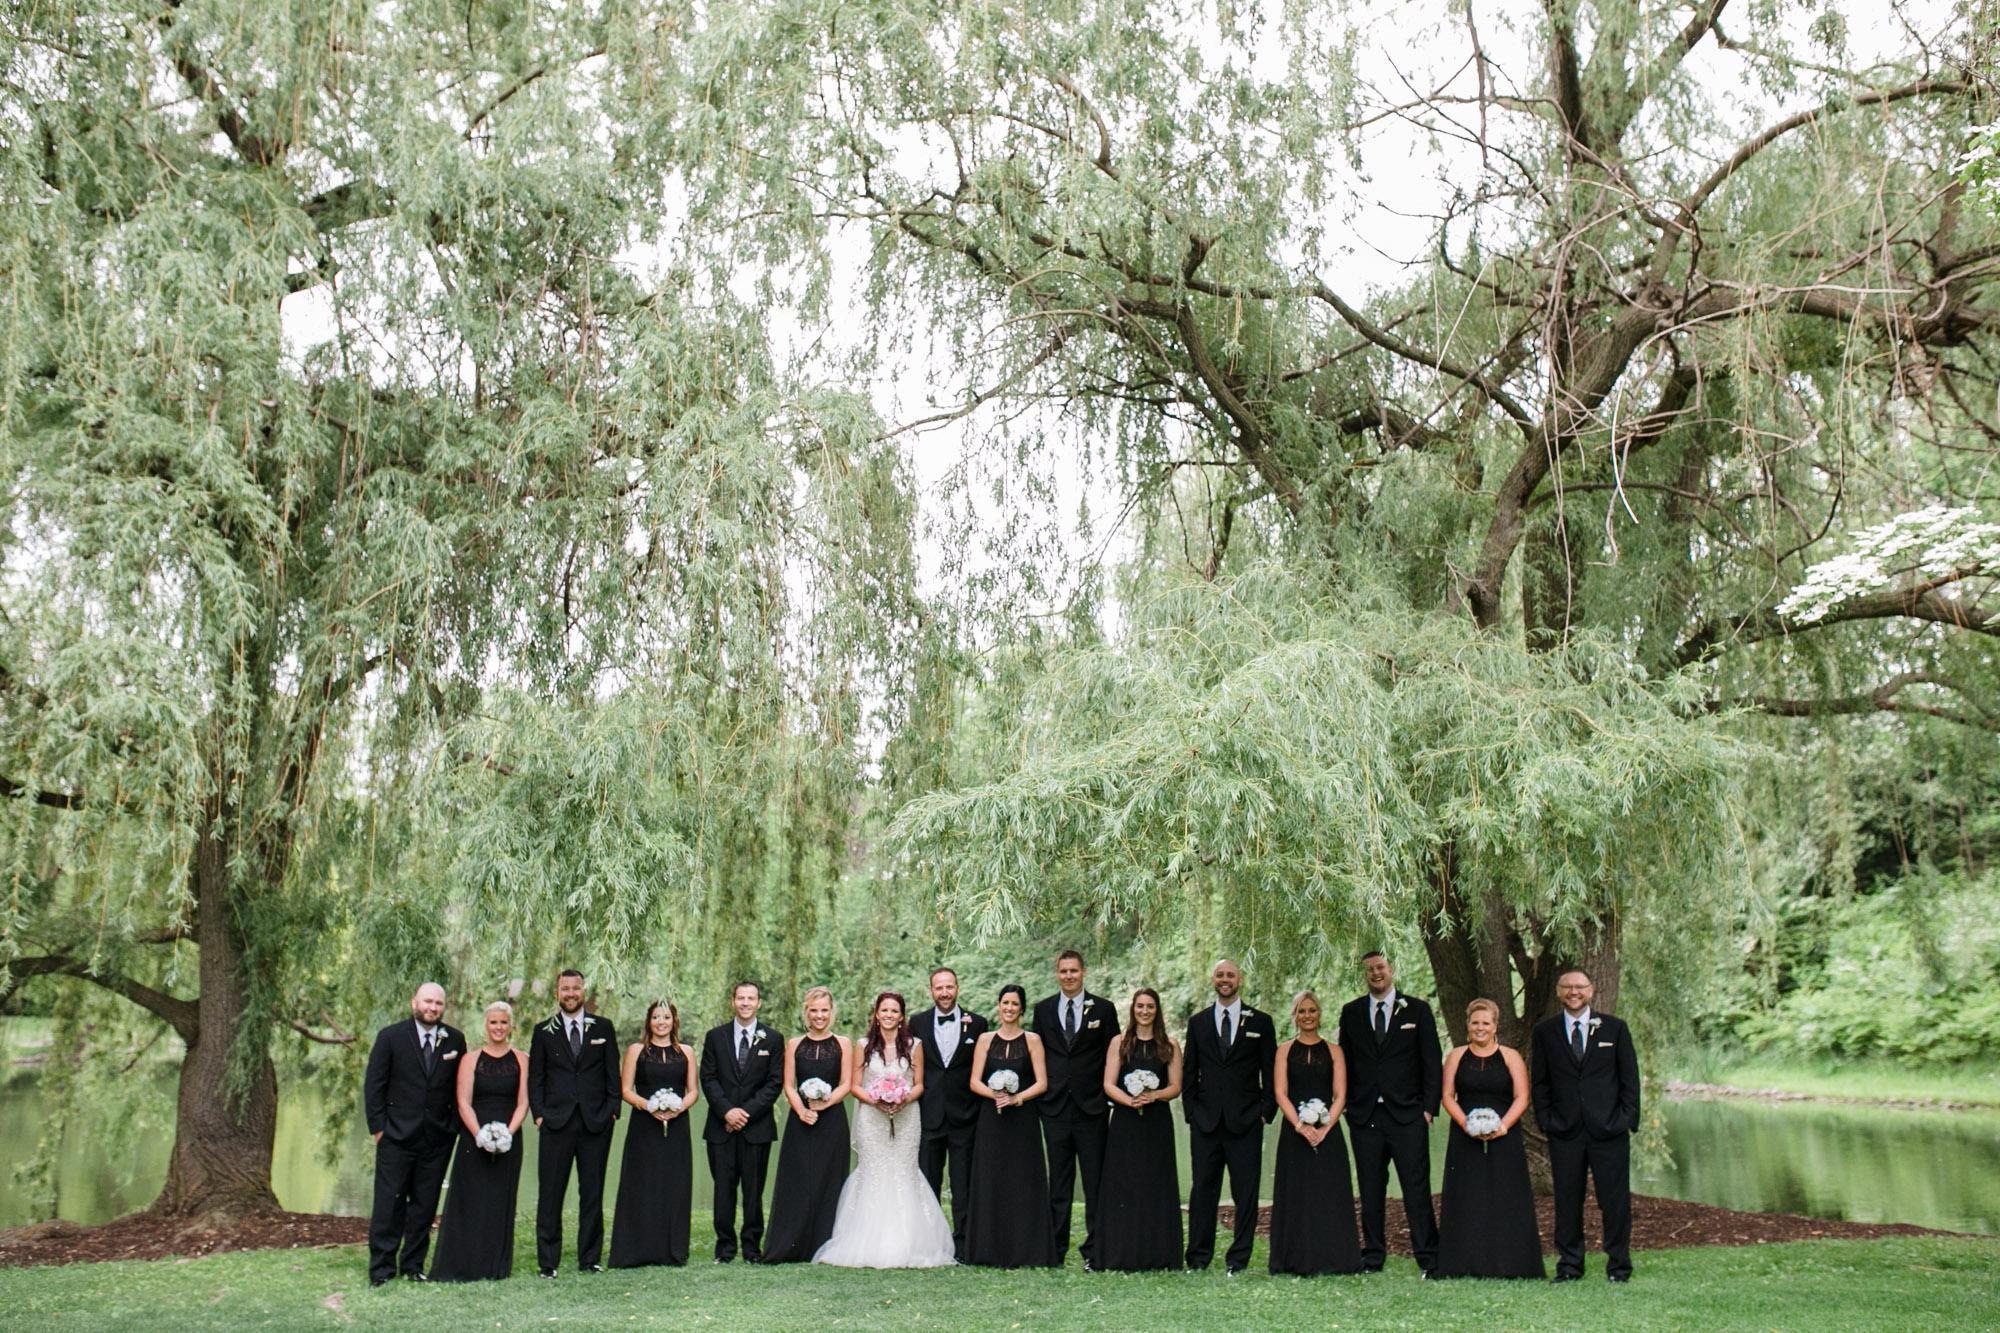 hensville-wedding-downtown-toledo-ohio (56 of 103).jpg